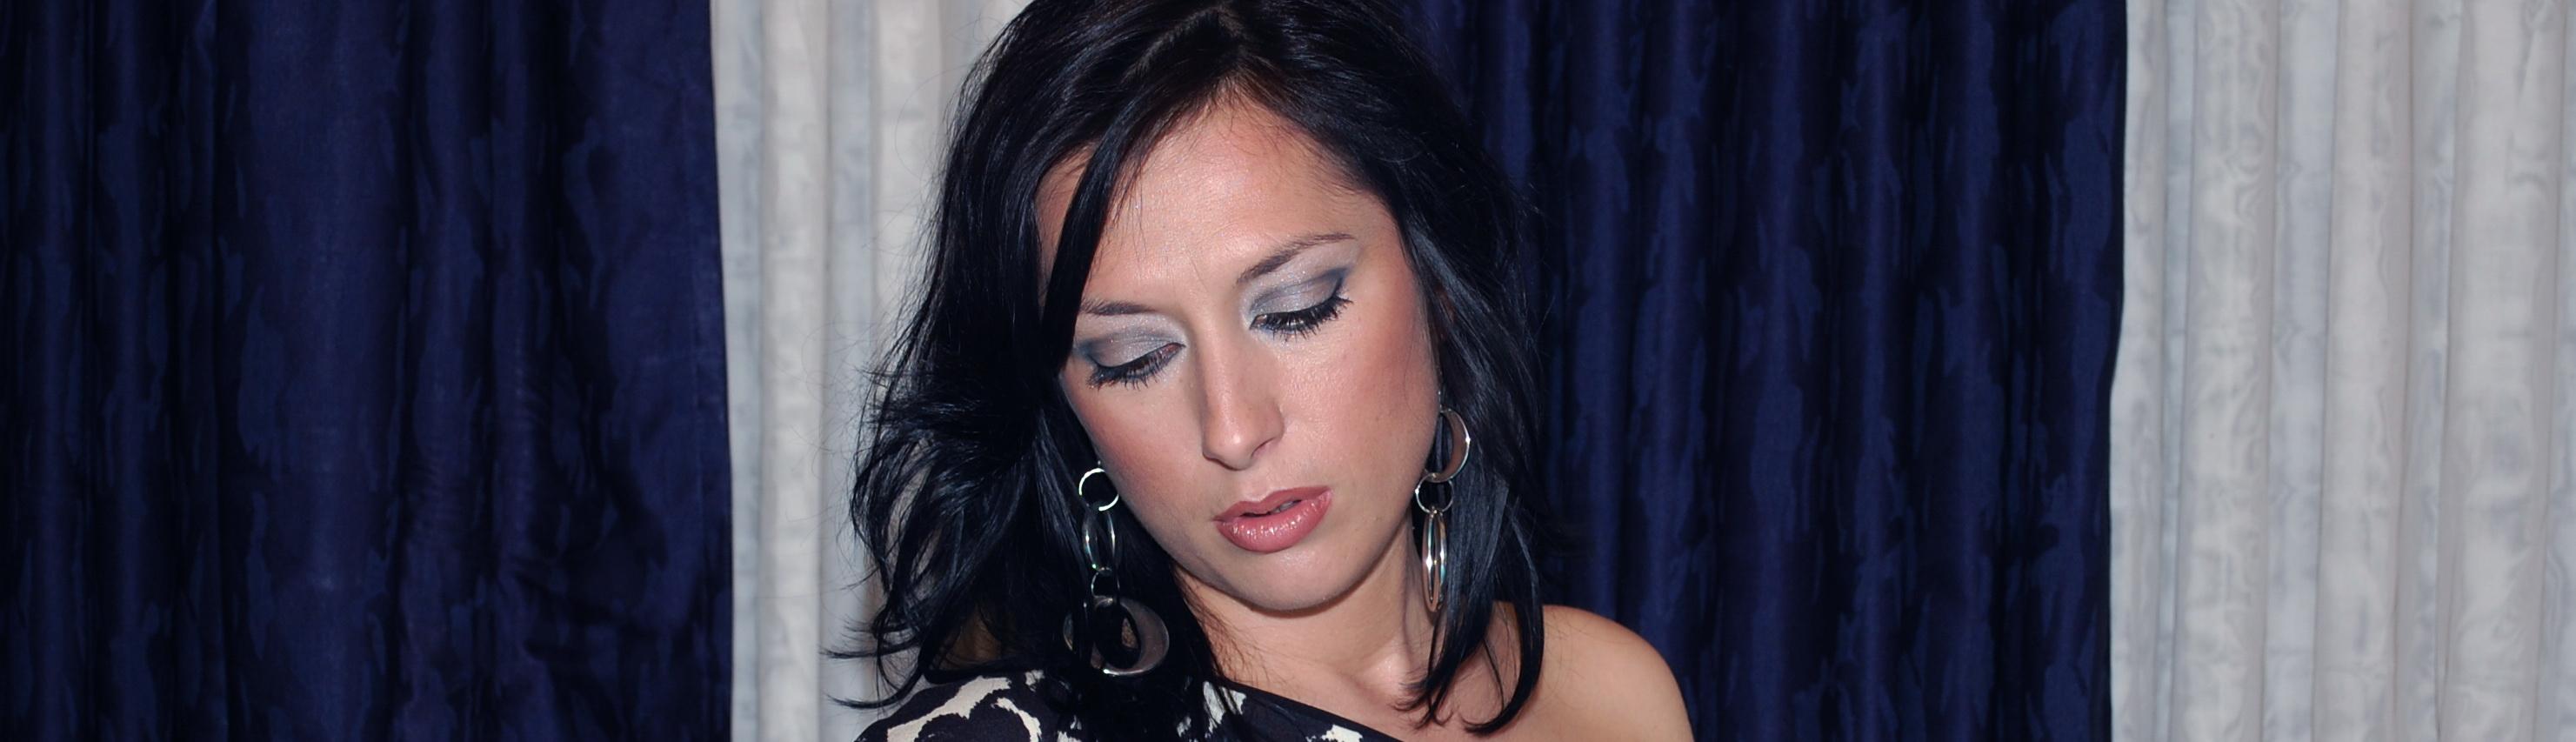 Ana Cirkovic-vokalni solista